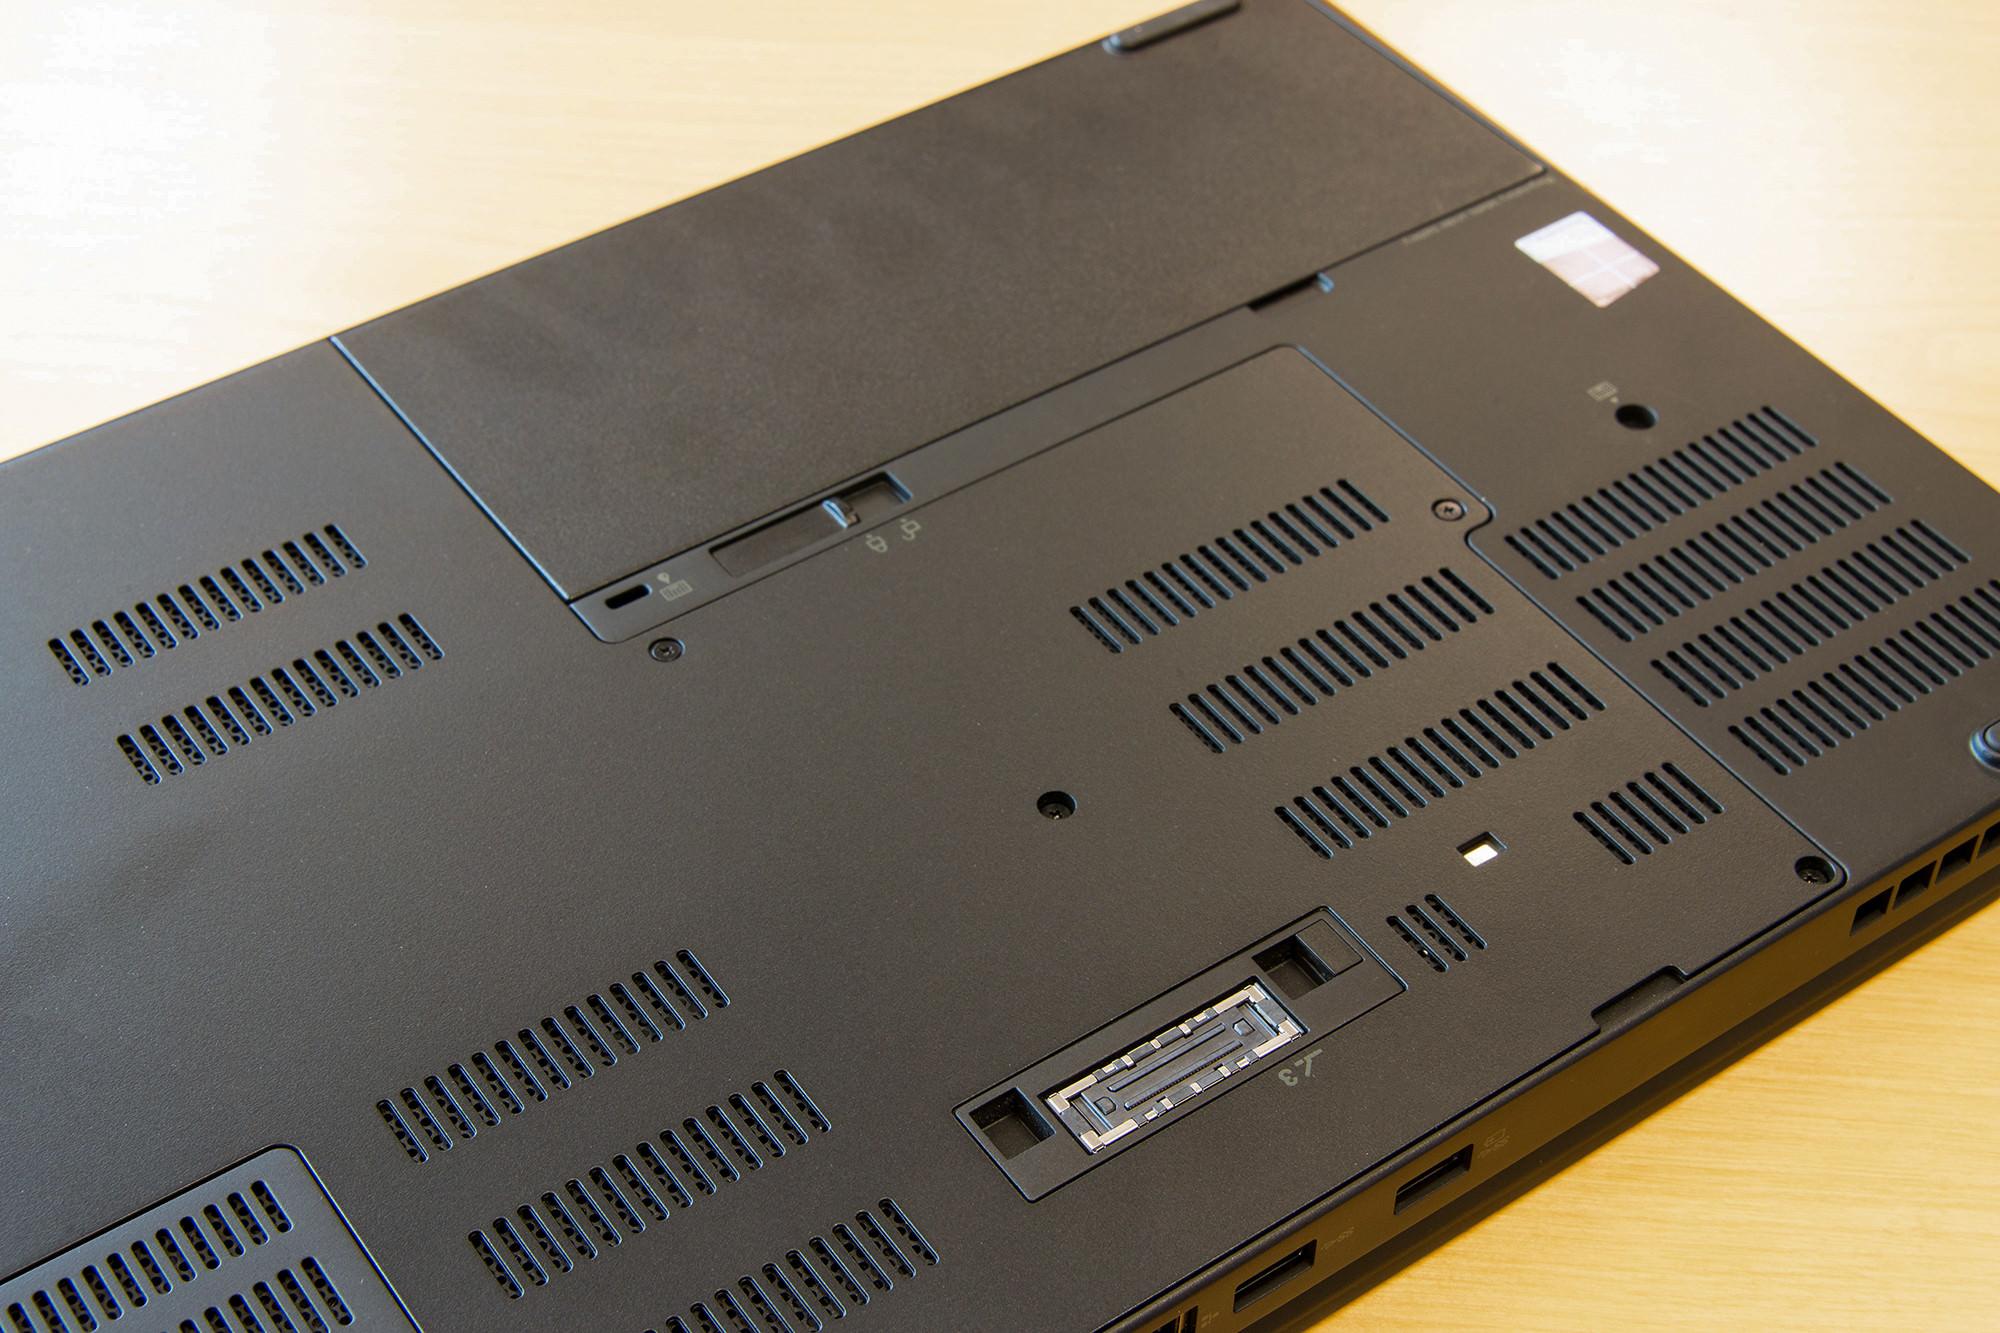 lenovo-p50-laptop-bottom-2-2000x1333